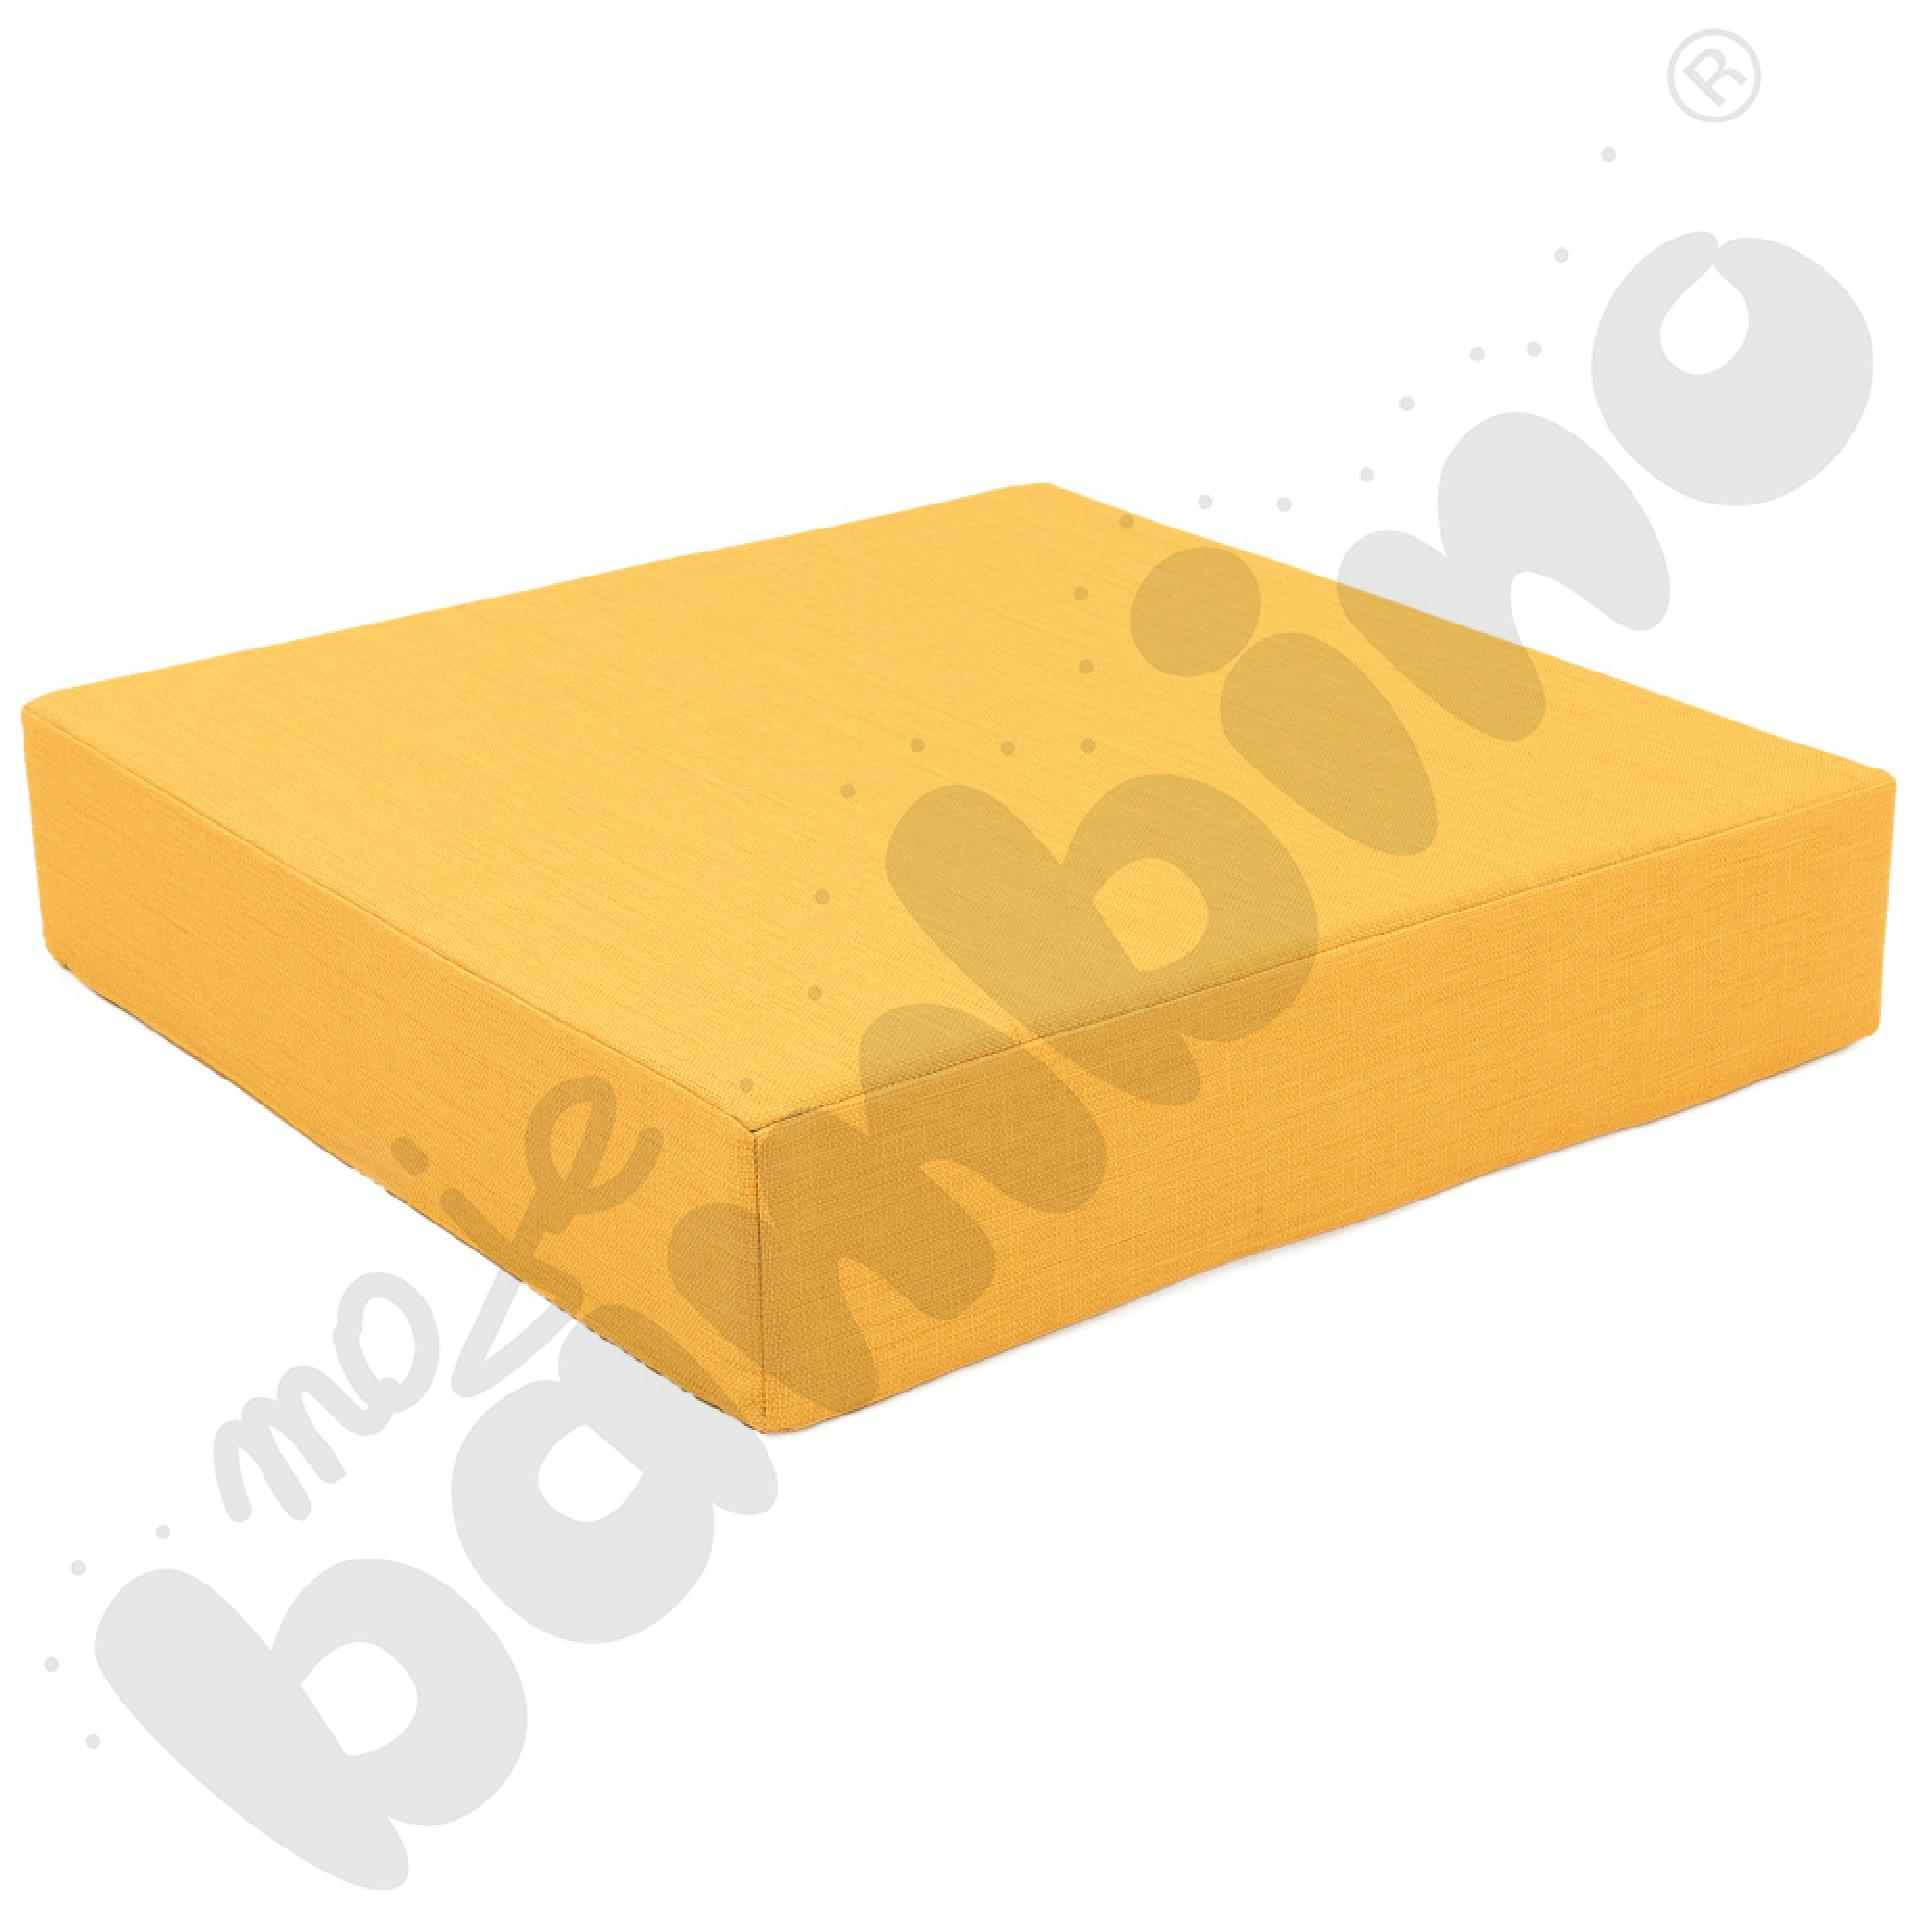 Materac Quadro 2 żółty,...aaa